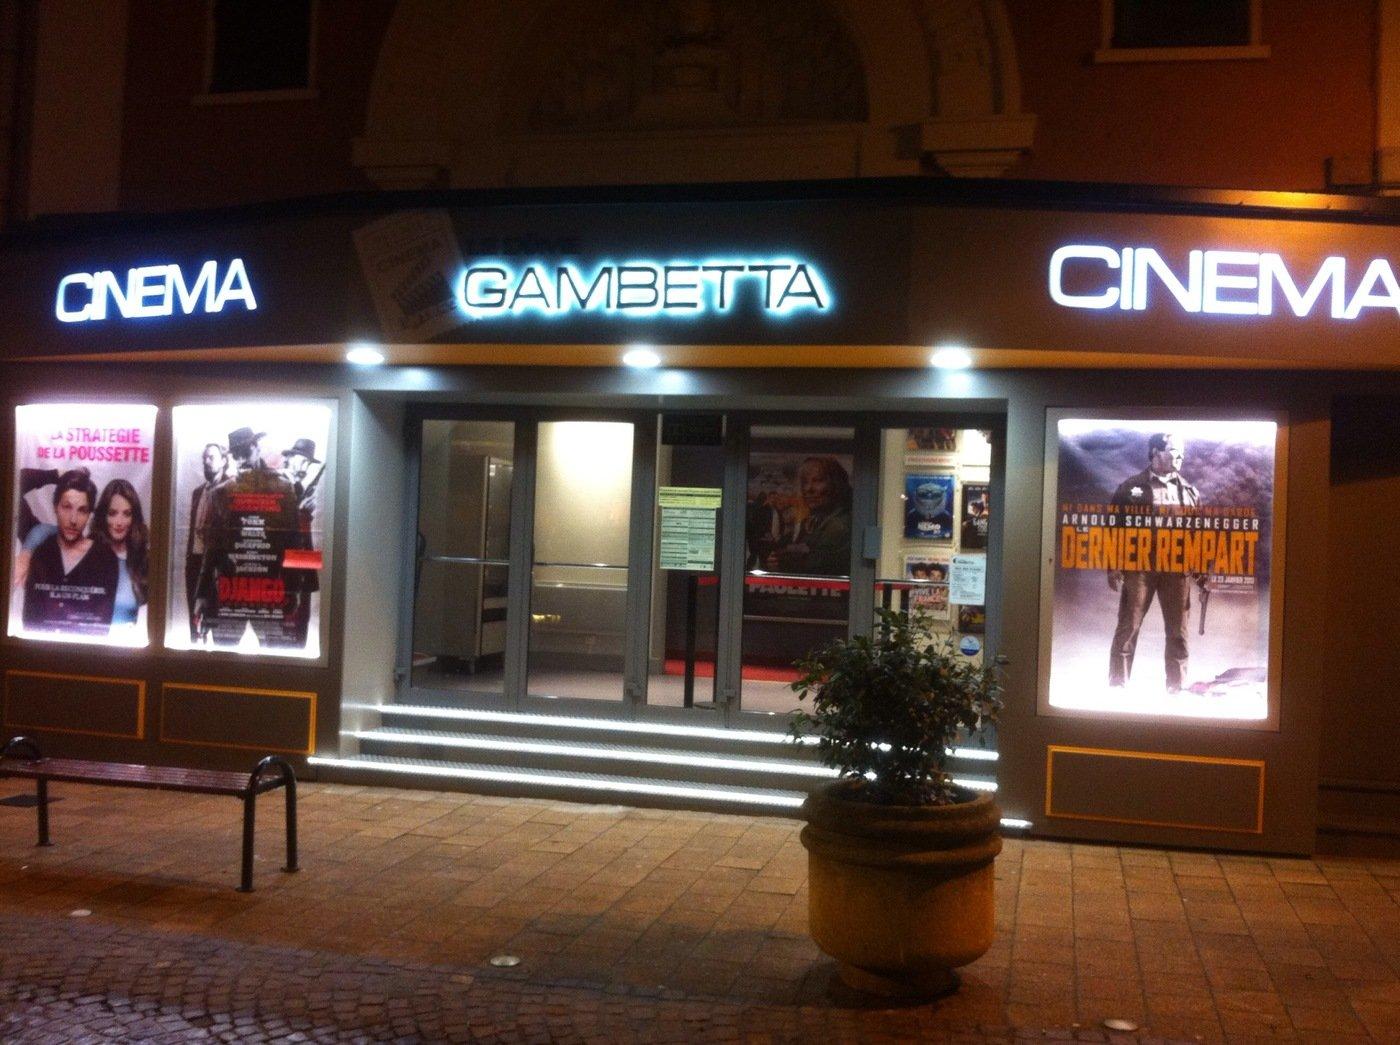 Cinéma Le Dôme Gambetta - Albertville by Duc Martin Elodie - Tél. 06 ...